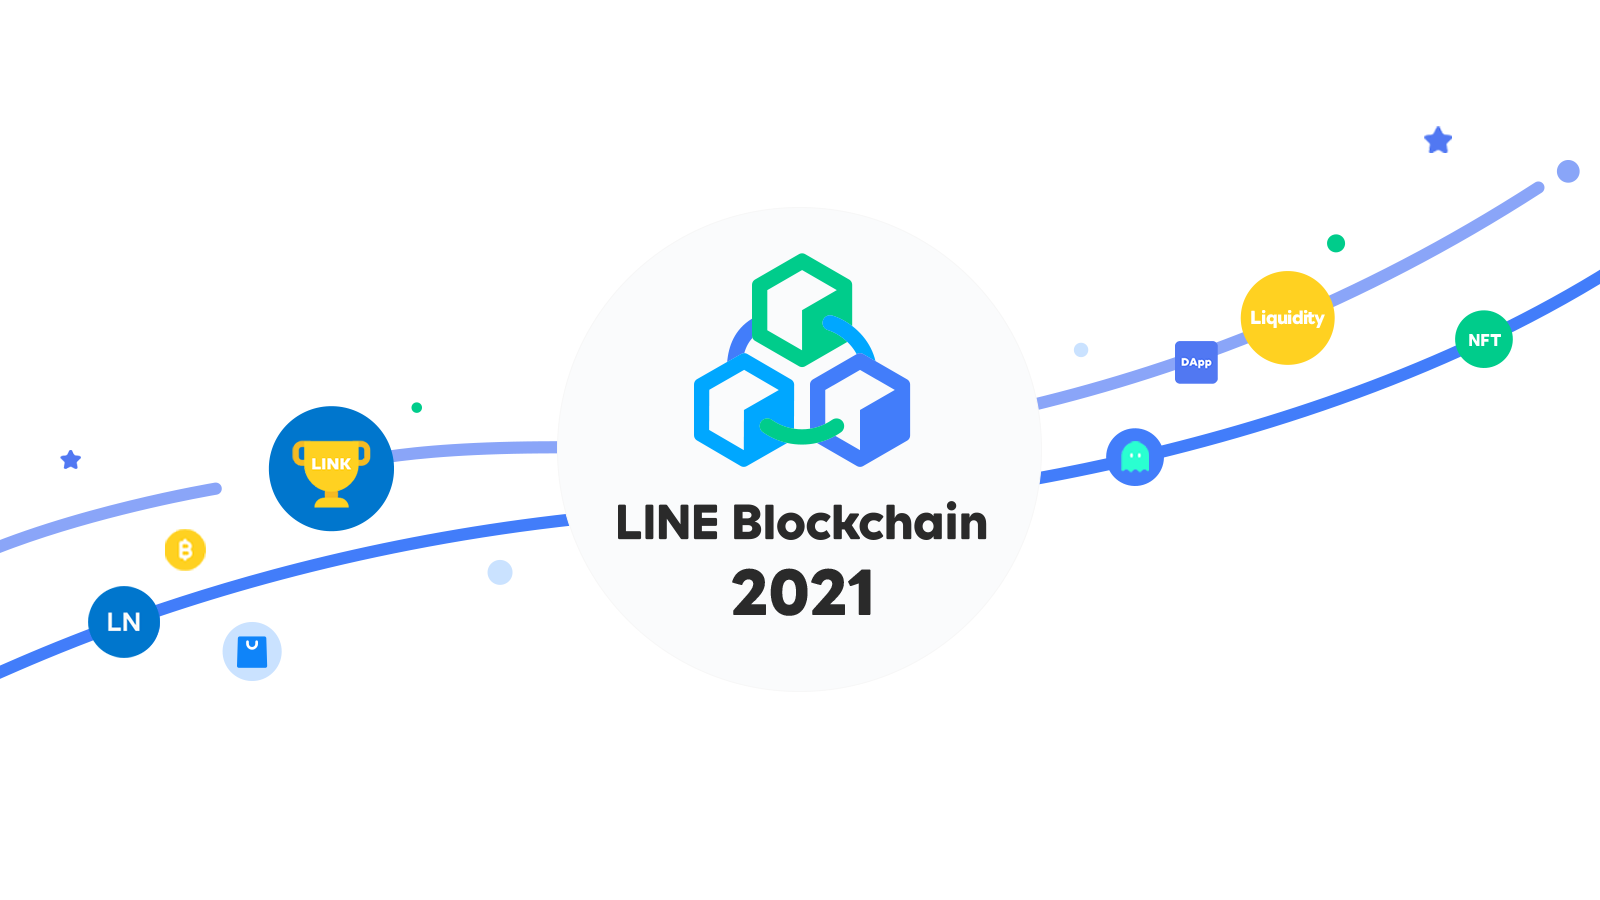 Bog LINE Blockchain